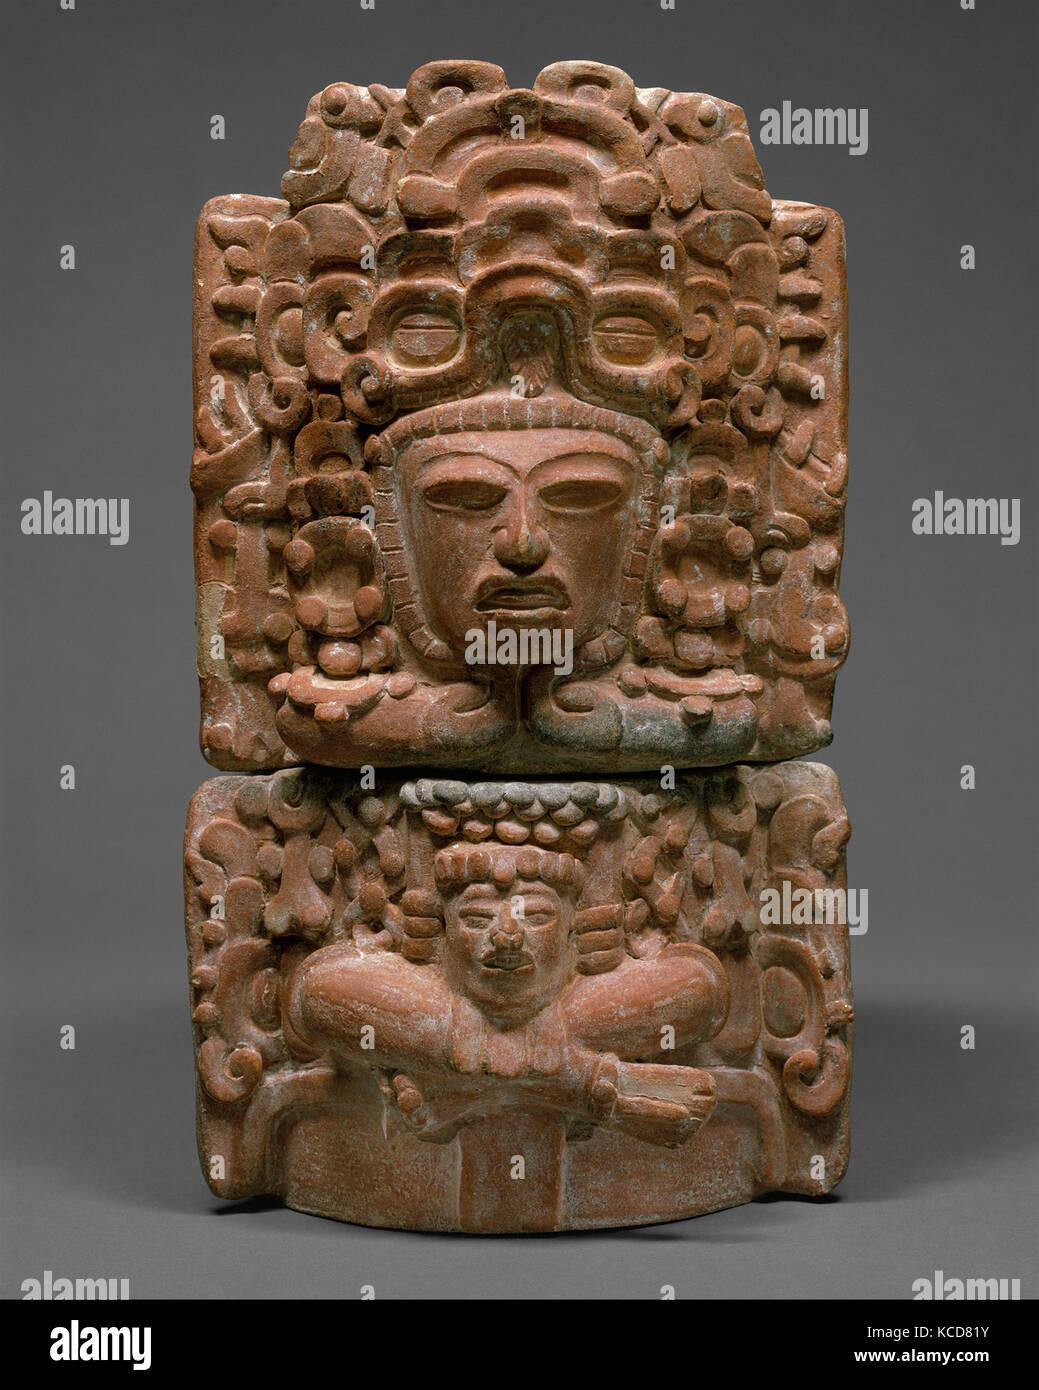 Seated Figure Censer (Incensario), 5th–6th century, Guatemala, Mesoamerica, Maya, Ceramic, H. 14 3/4 in. (37.5 cm), - Stock Image